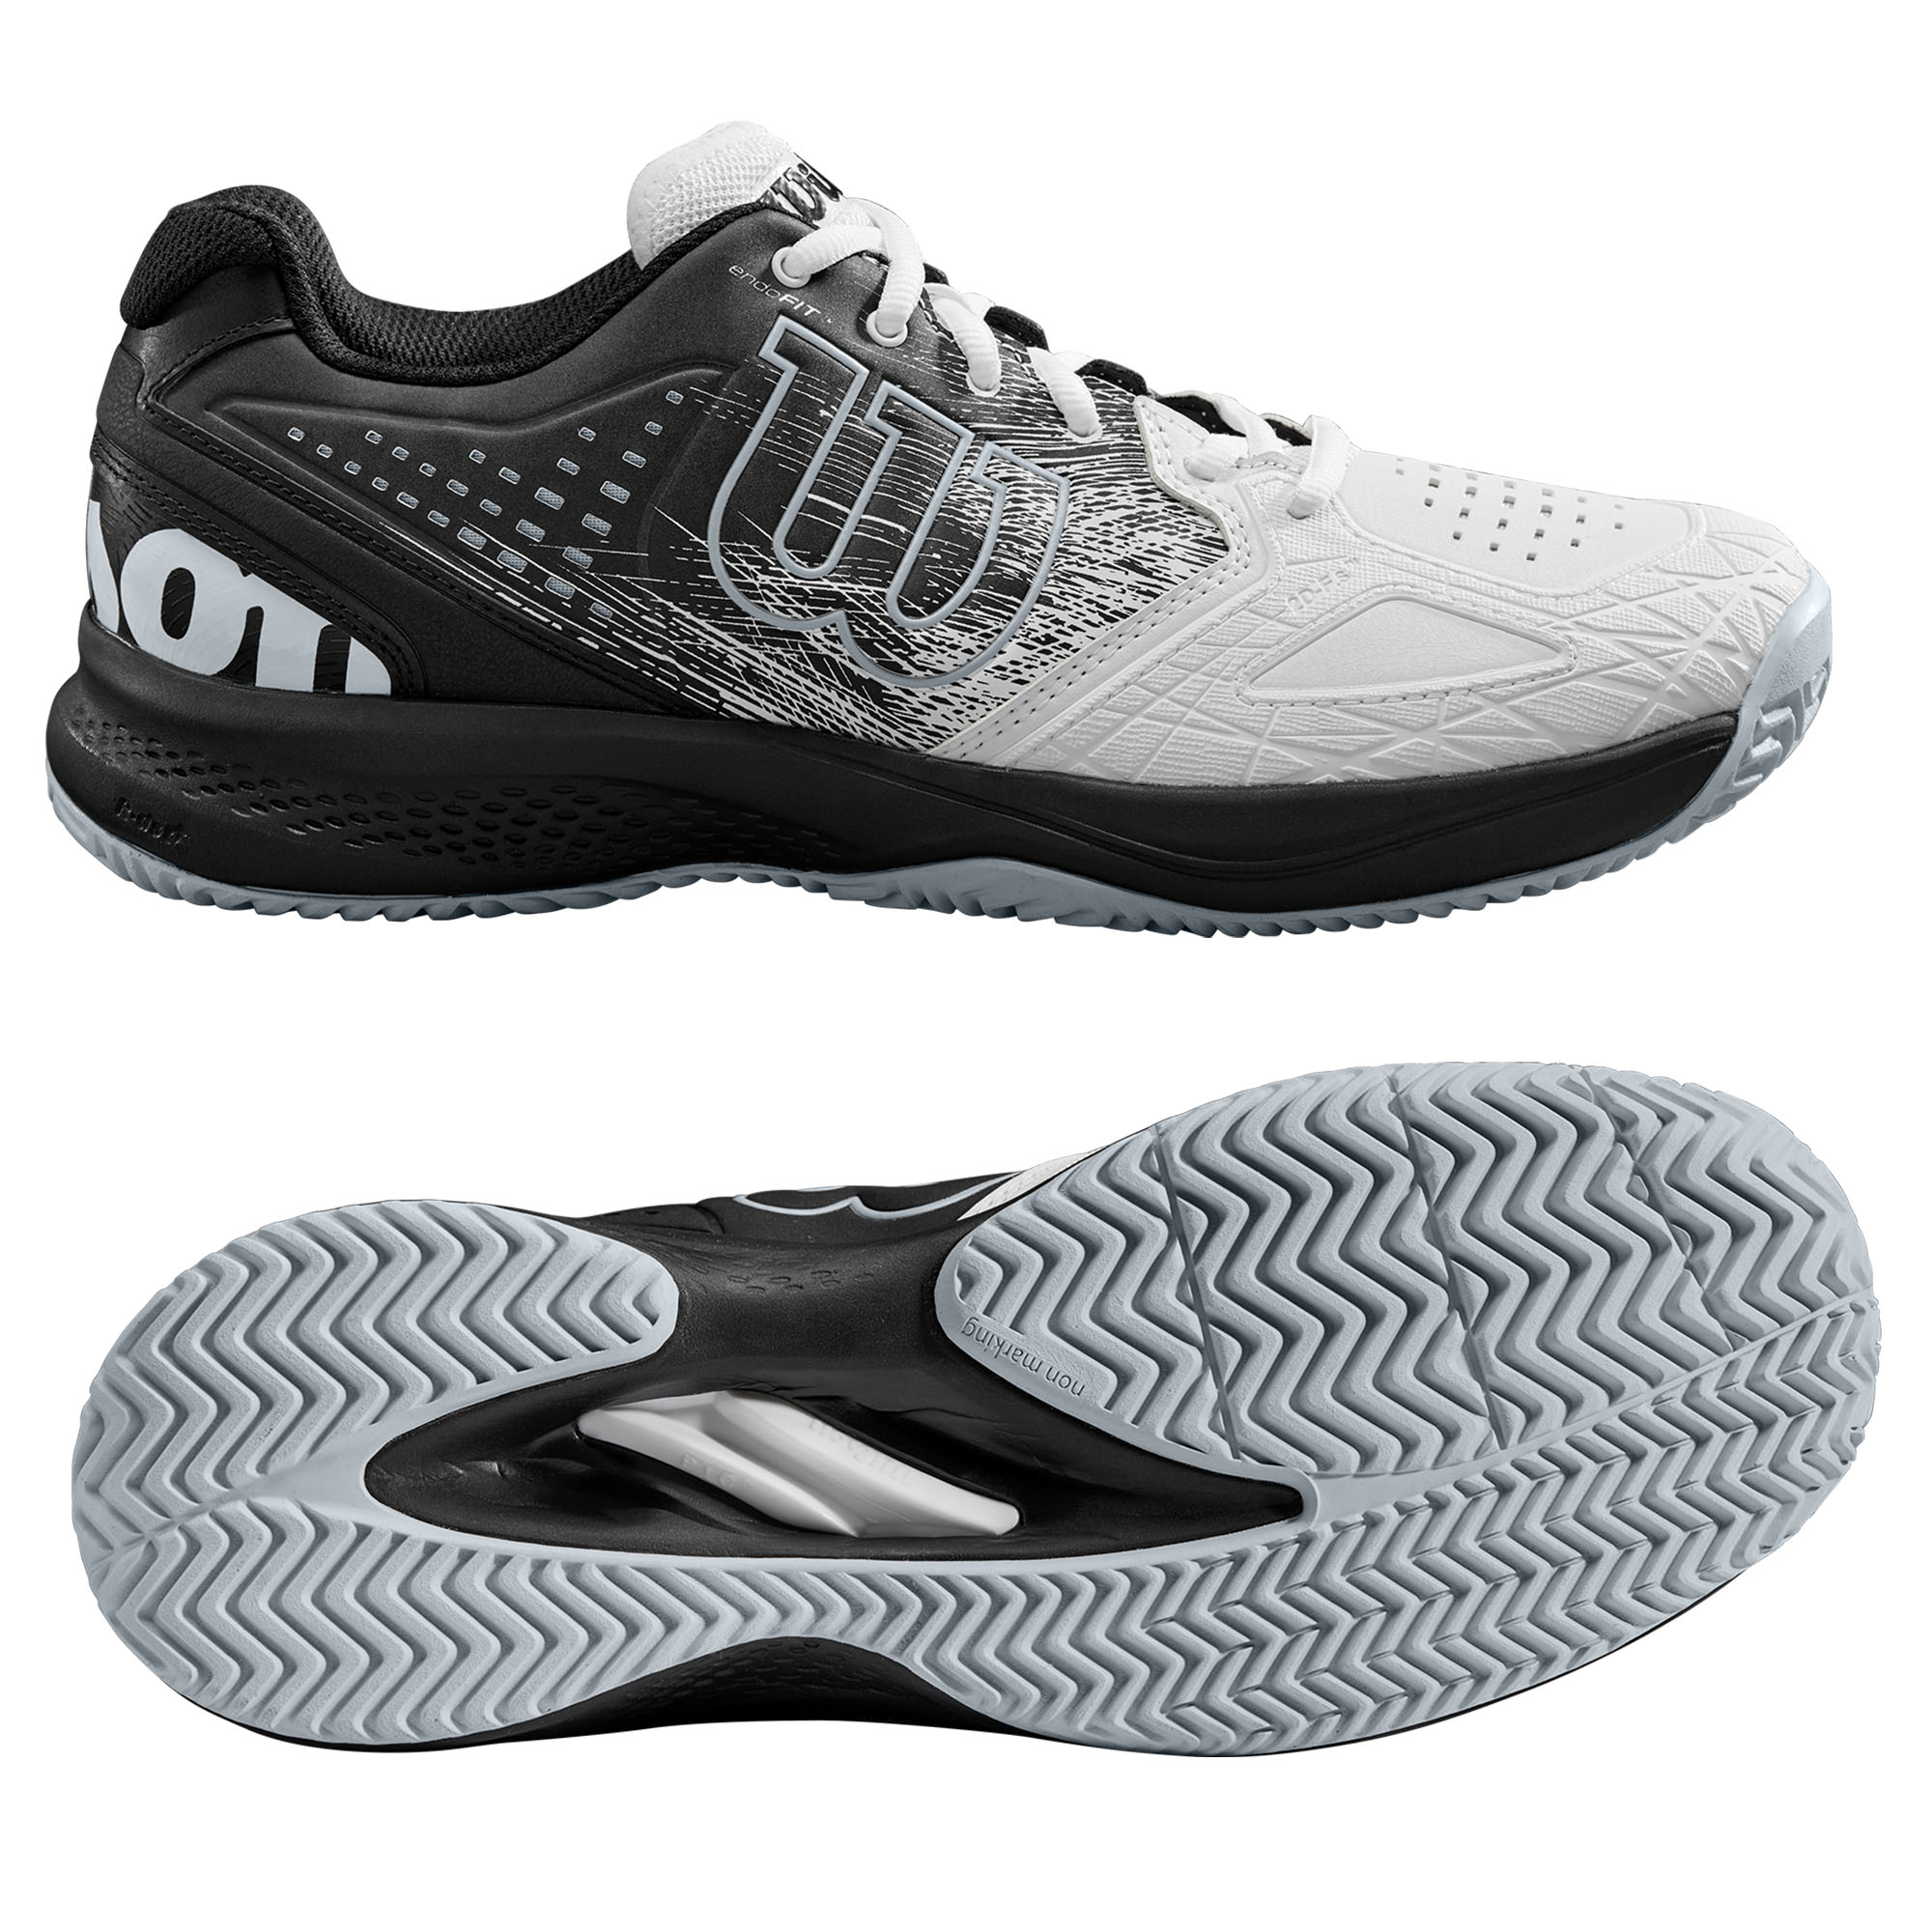 Wilson Kaos Comp 2.0 Mens Tennis Shoes